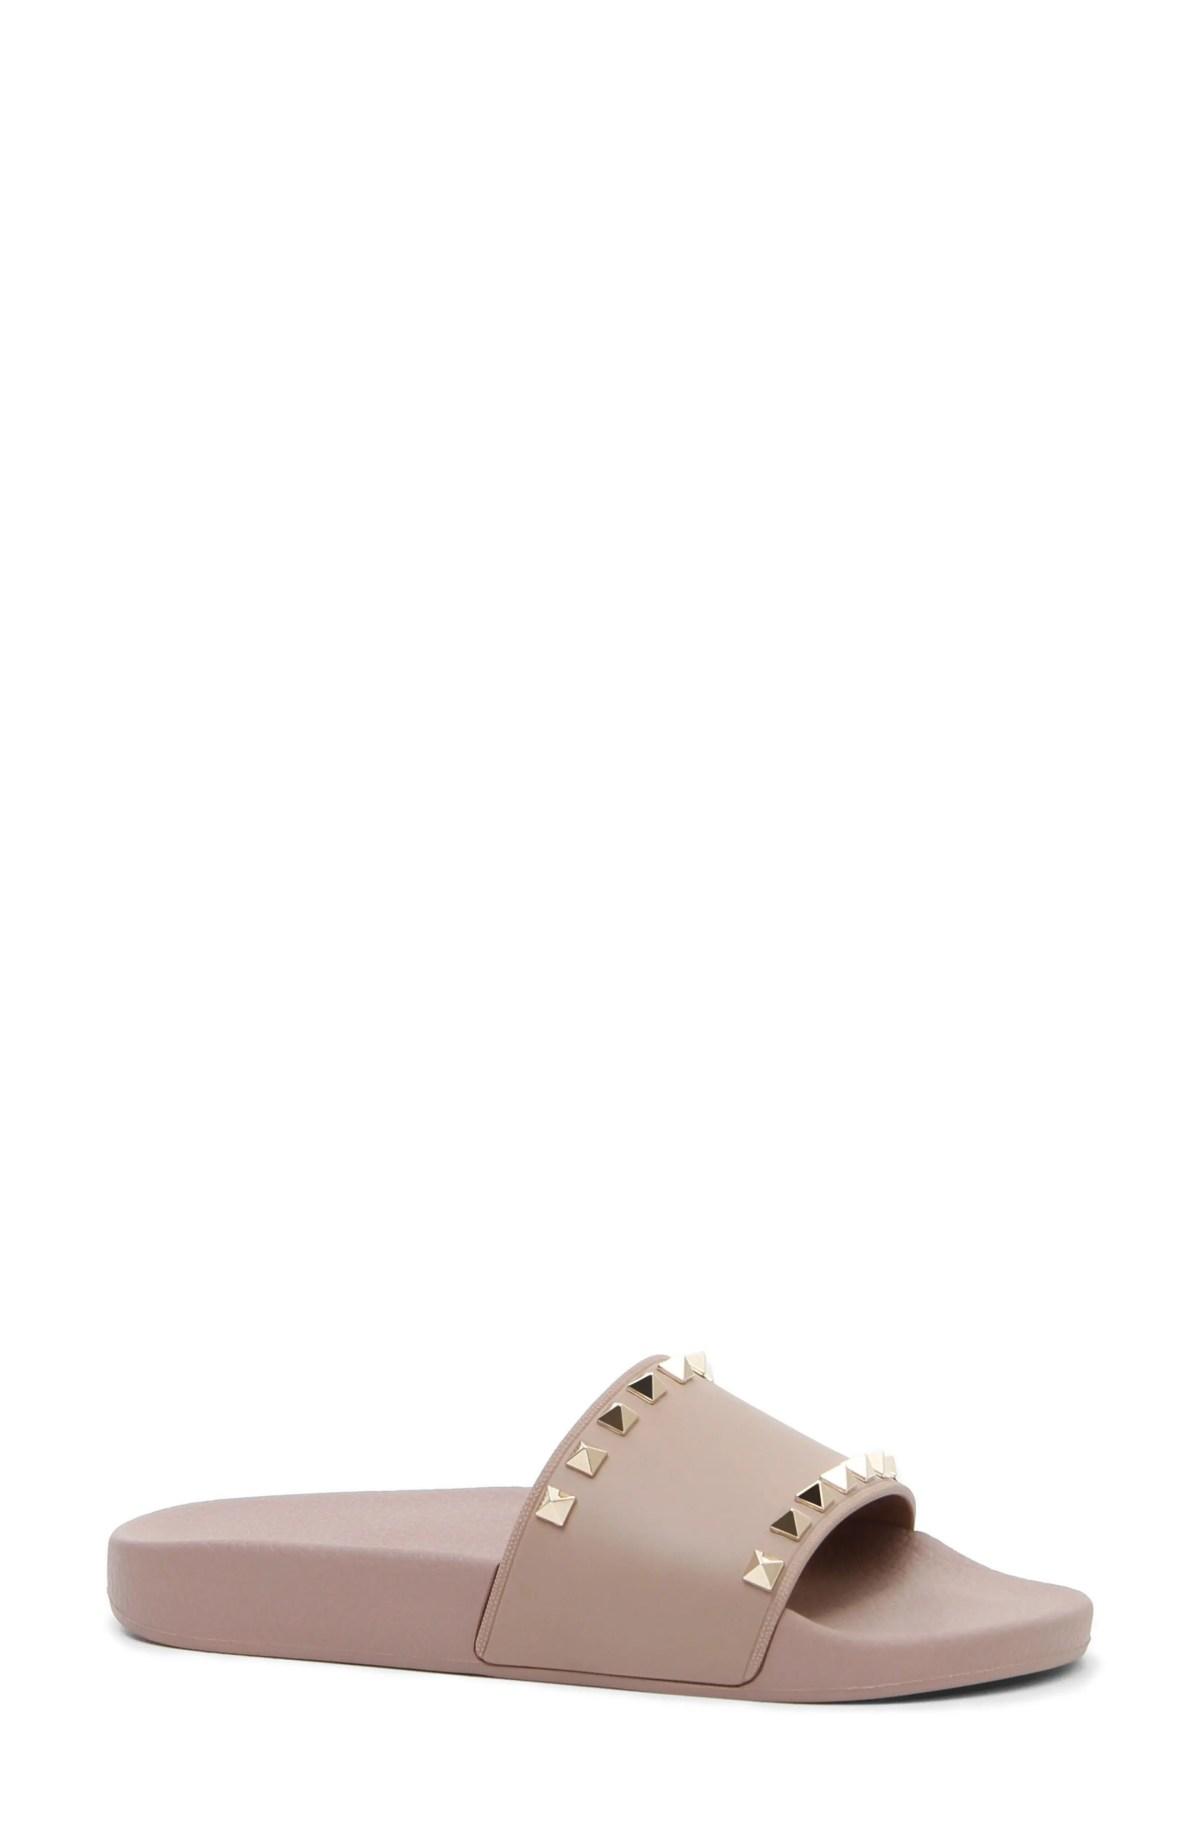 VALENTINO GARAVANI Rockstud Slide Sandal, Main, color, POUDRE